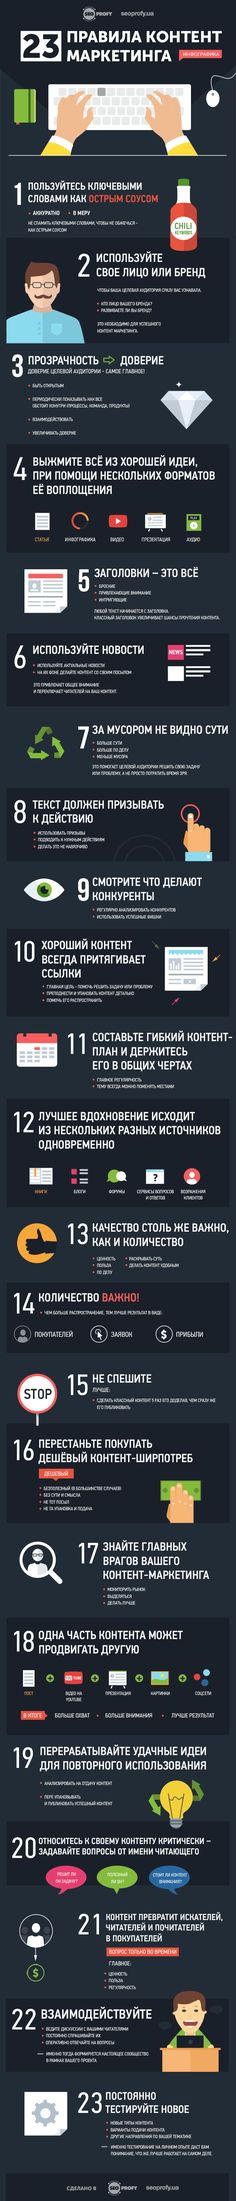 Инфографика: 23 правила контент маркетинга - инфографика от SeoProfy